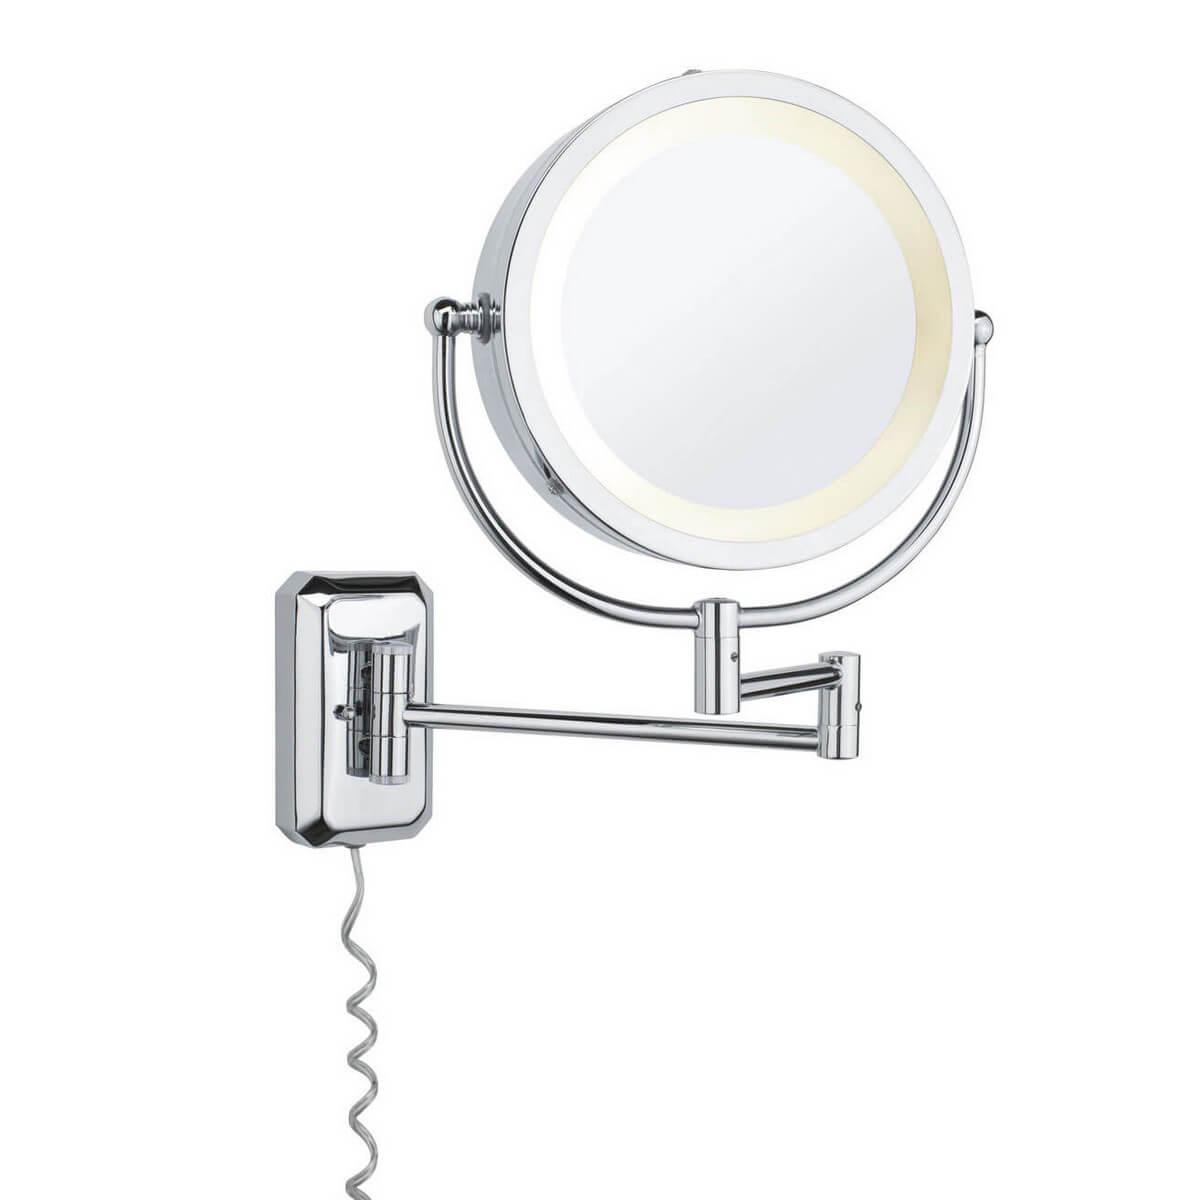 Подсветка для зеркал Paulmann 70349 Bela